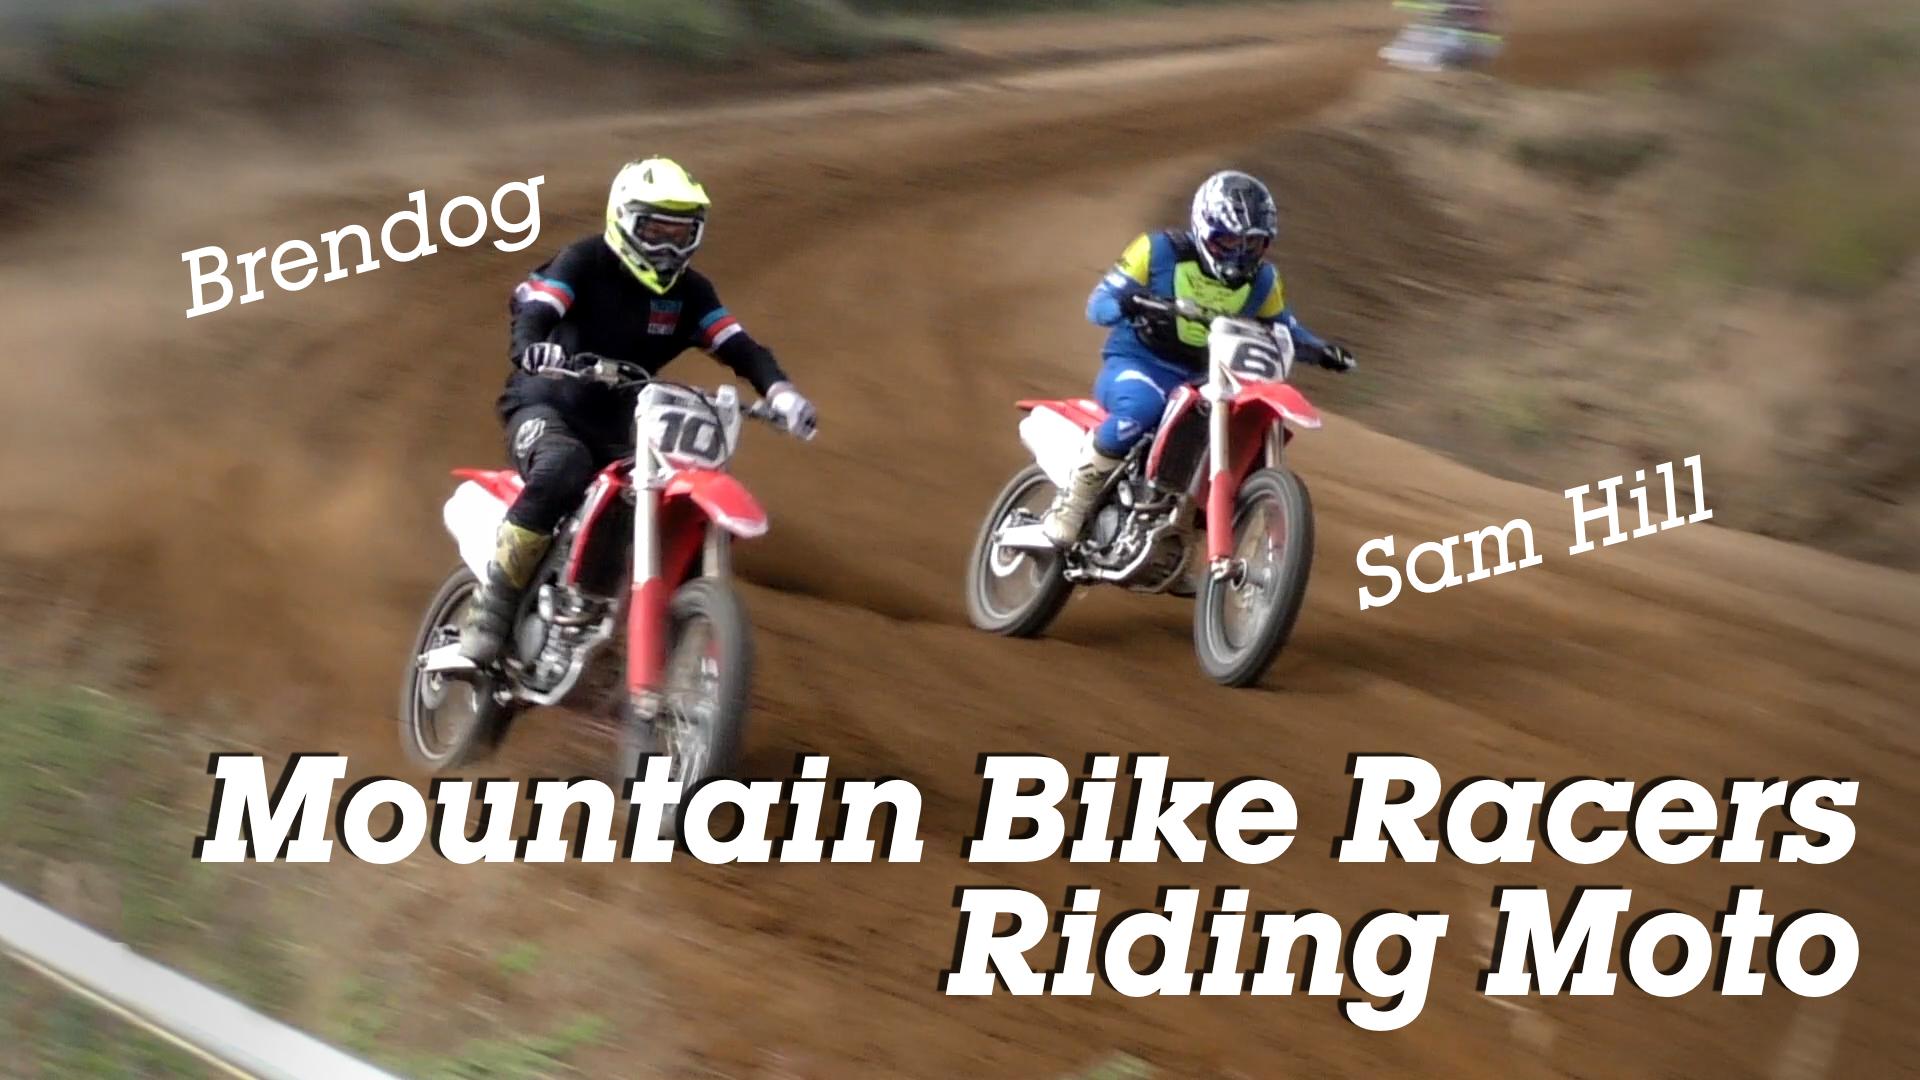 Mountain Bike Racers Riding Moto - Sam Hill, Brendan Fairclough & More